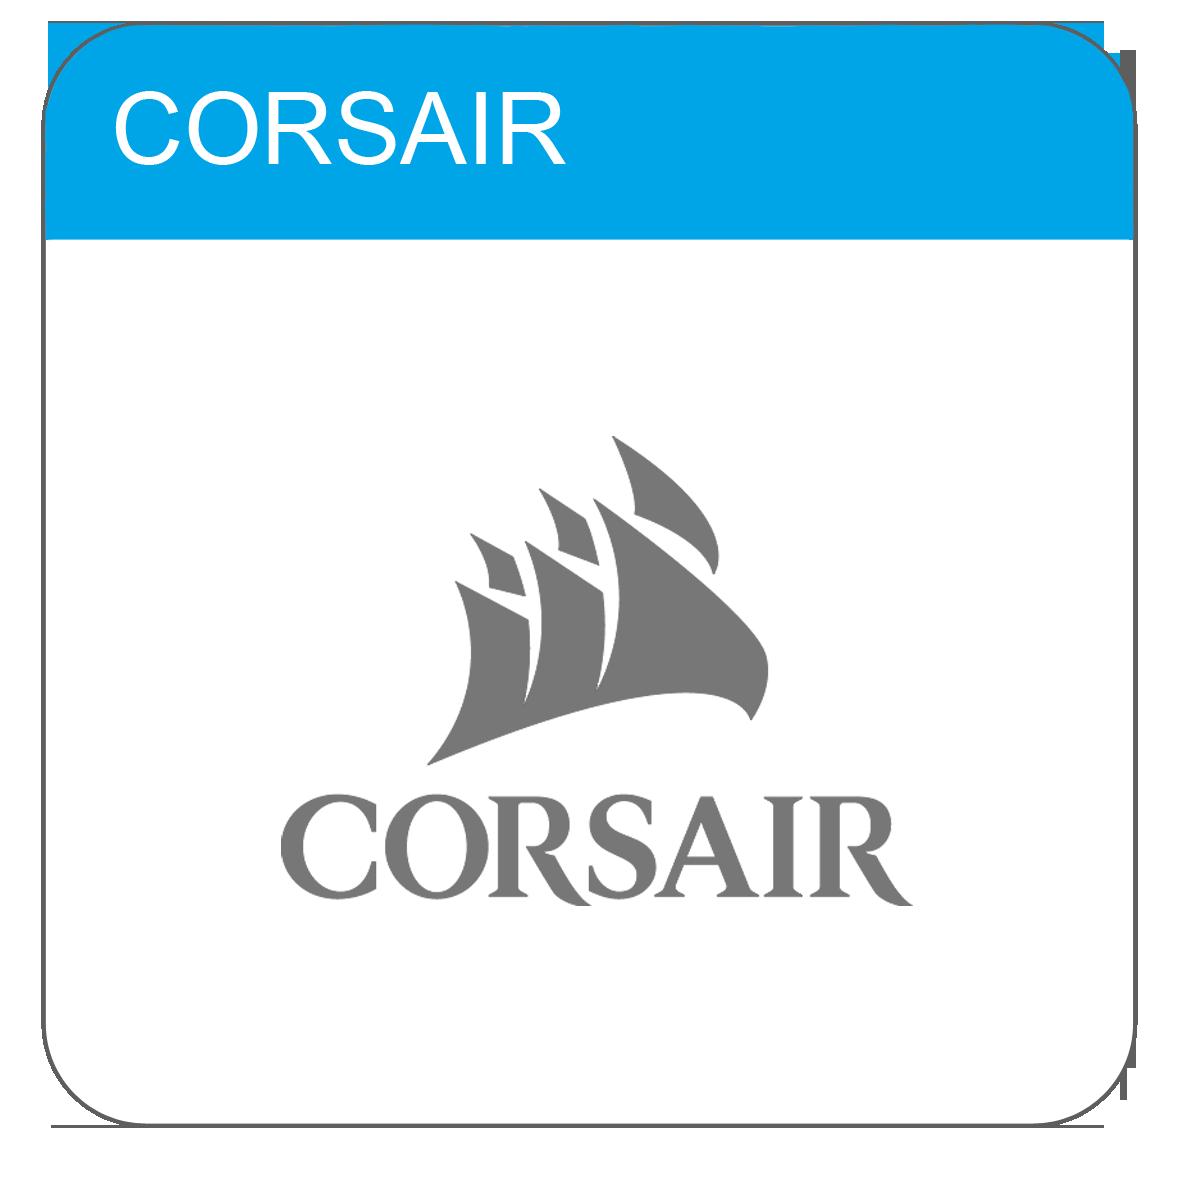 Corsair Drivers & Handleidingen